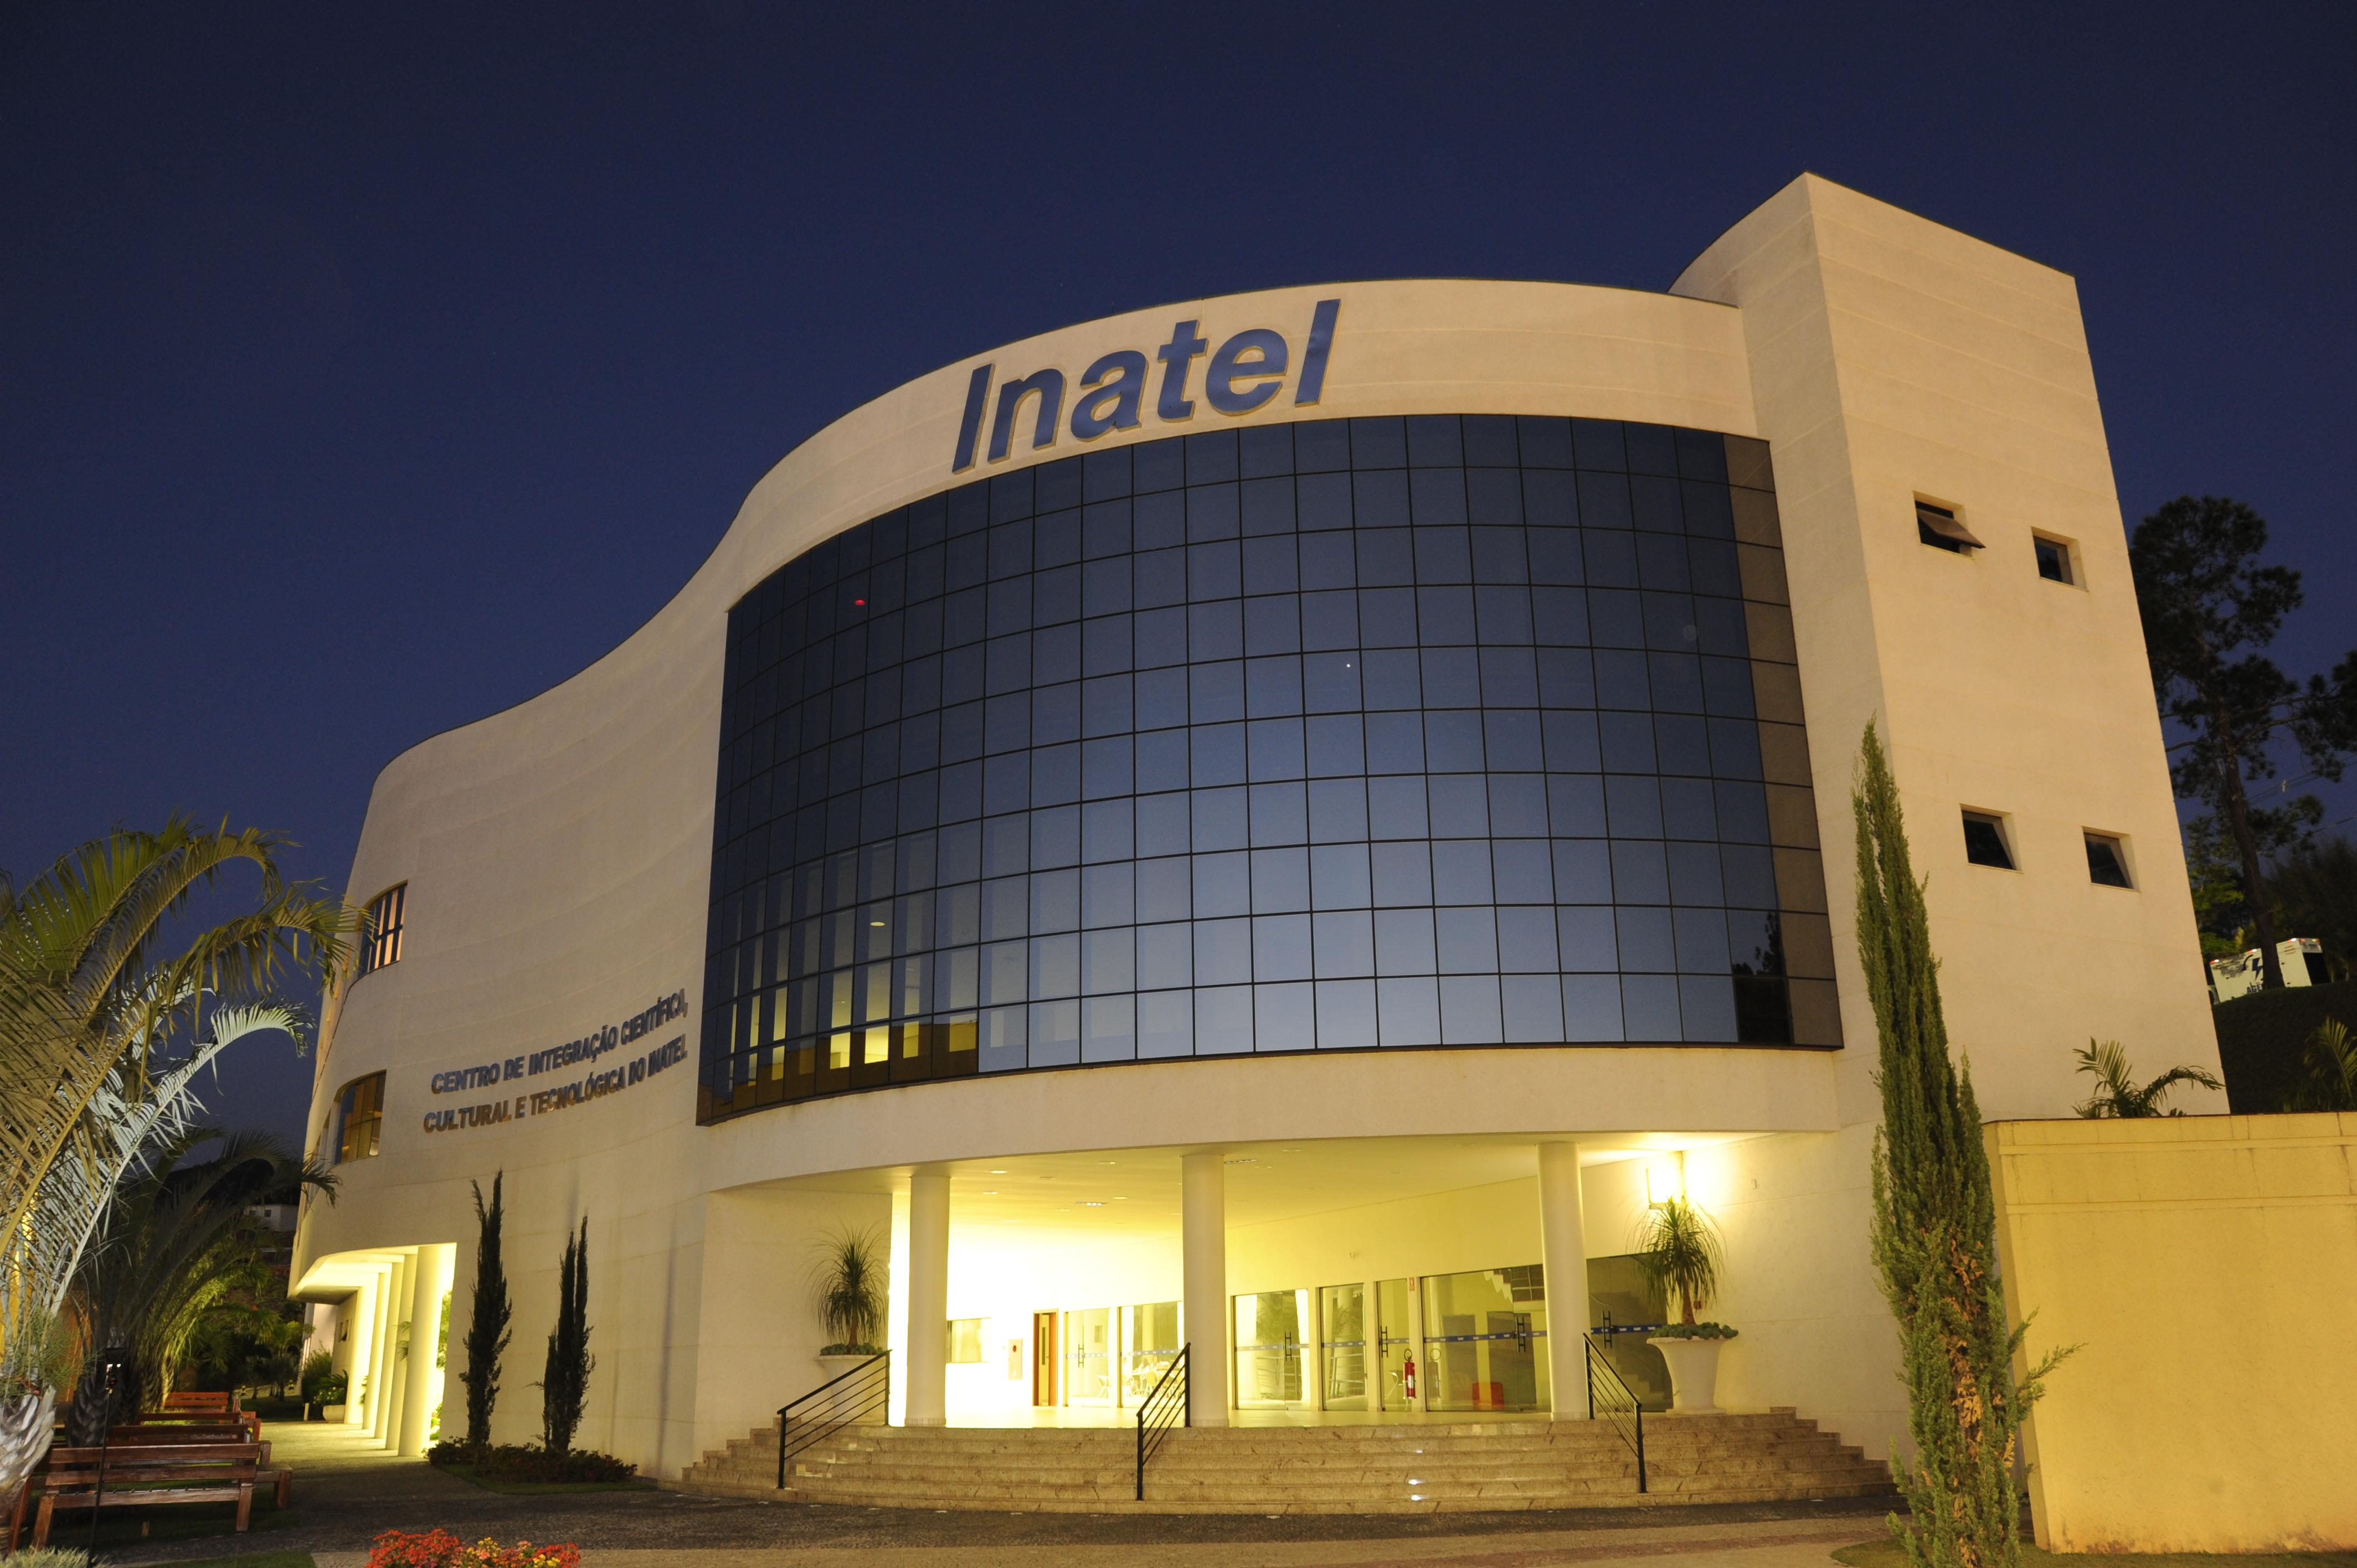 Campus Inatel - onde parte do 5G está sendo desenvolvido